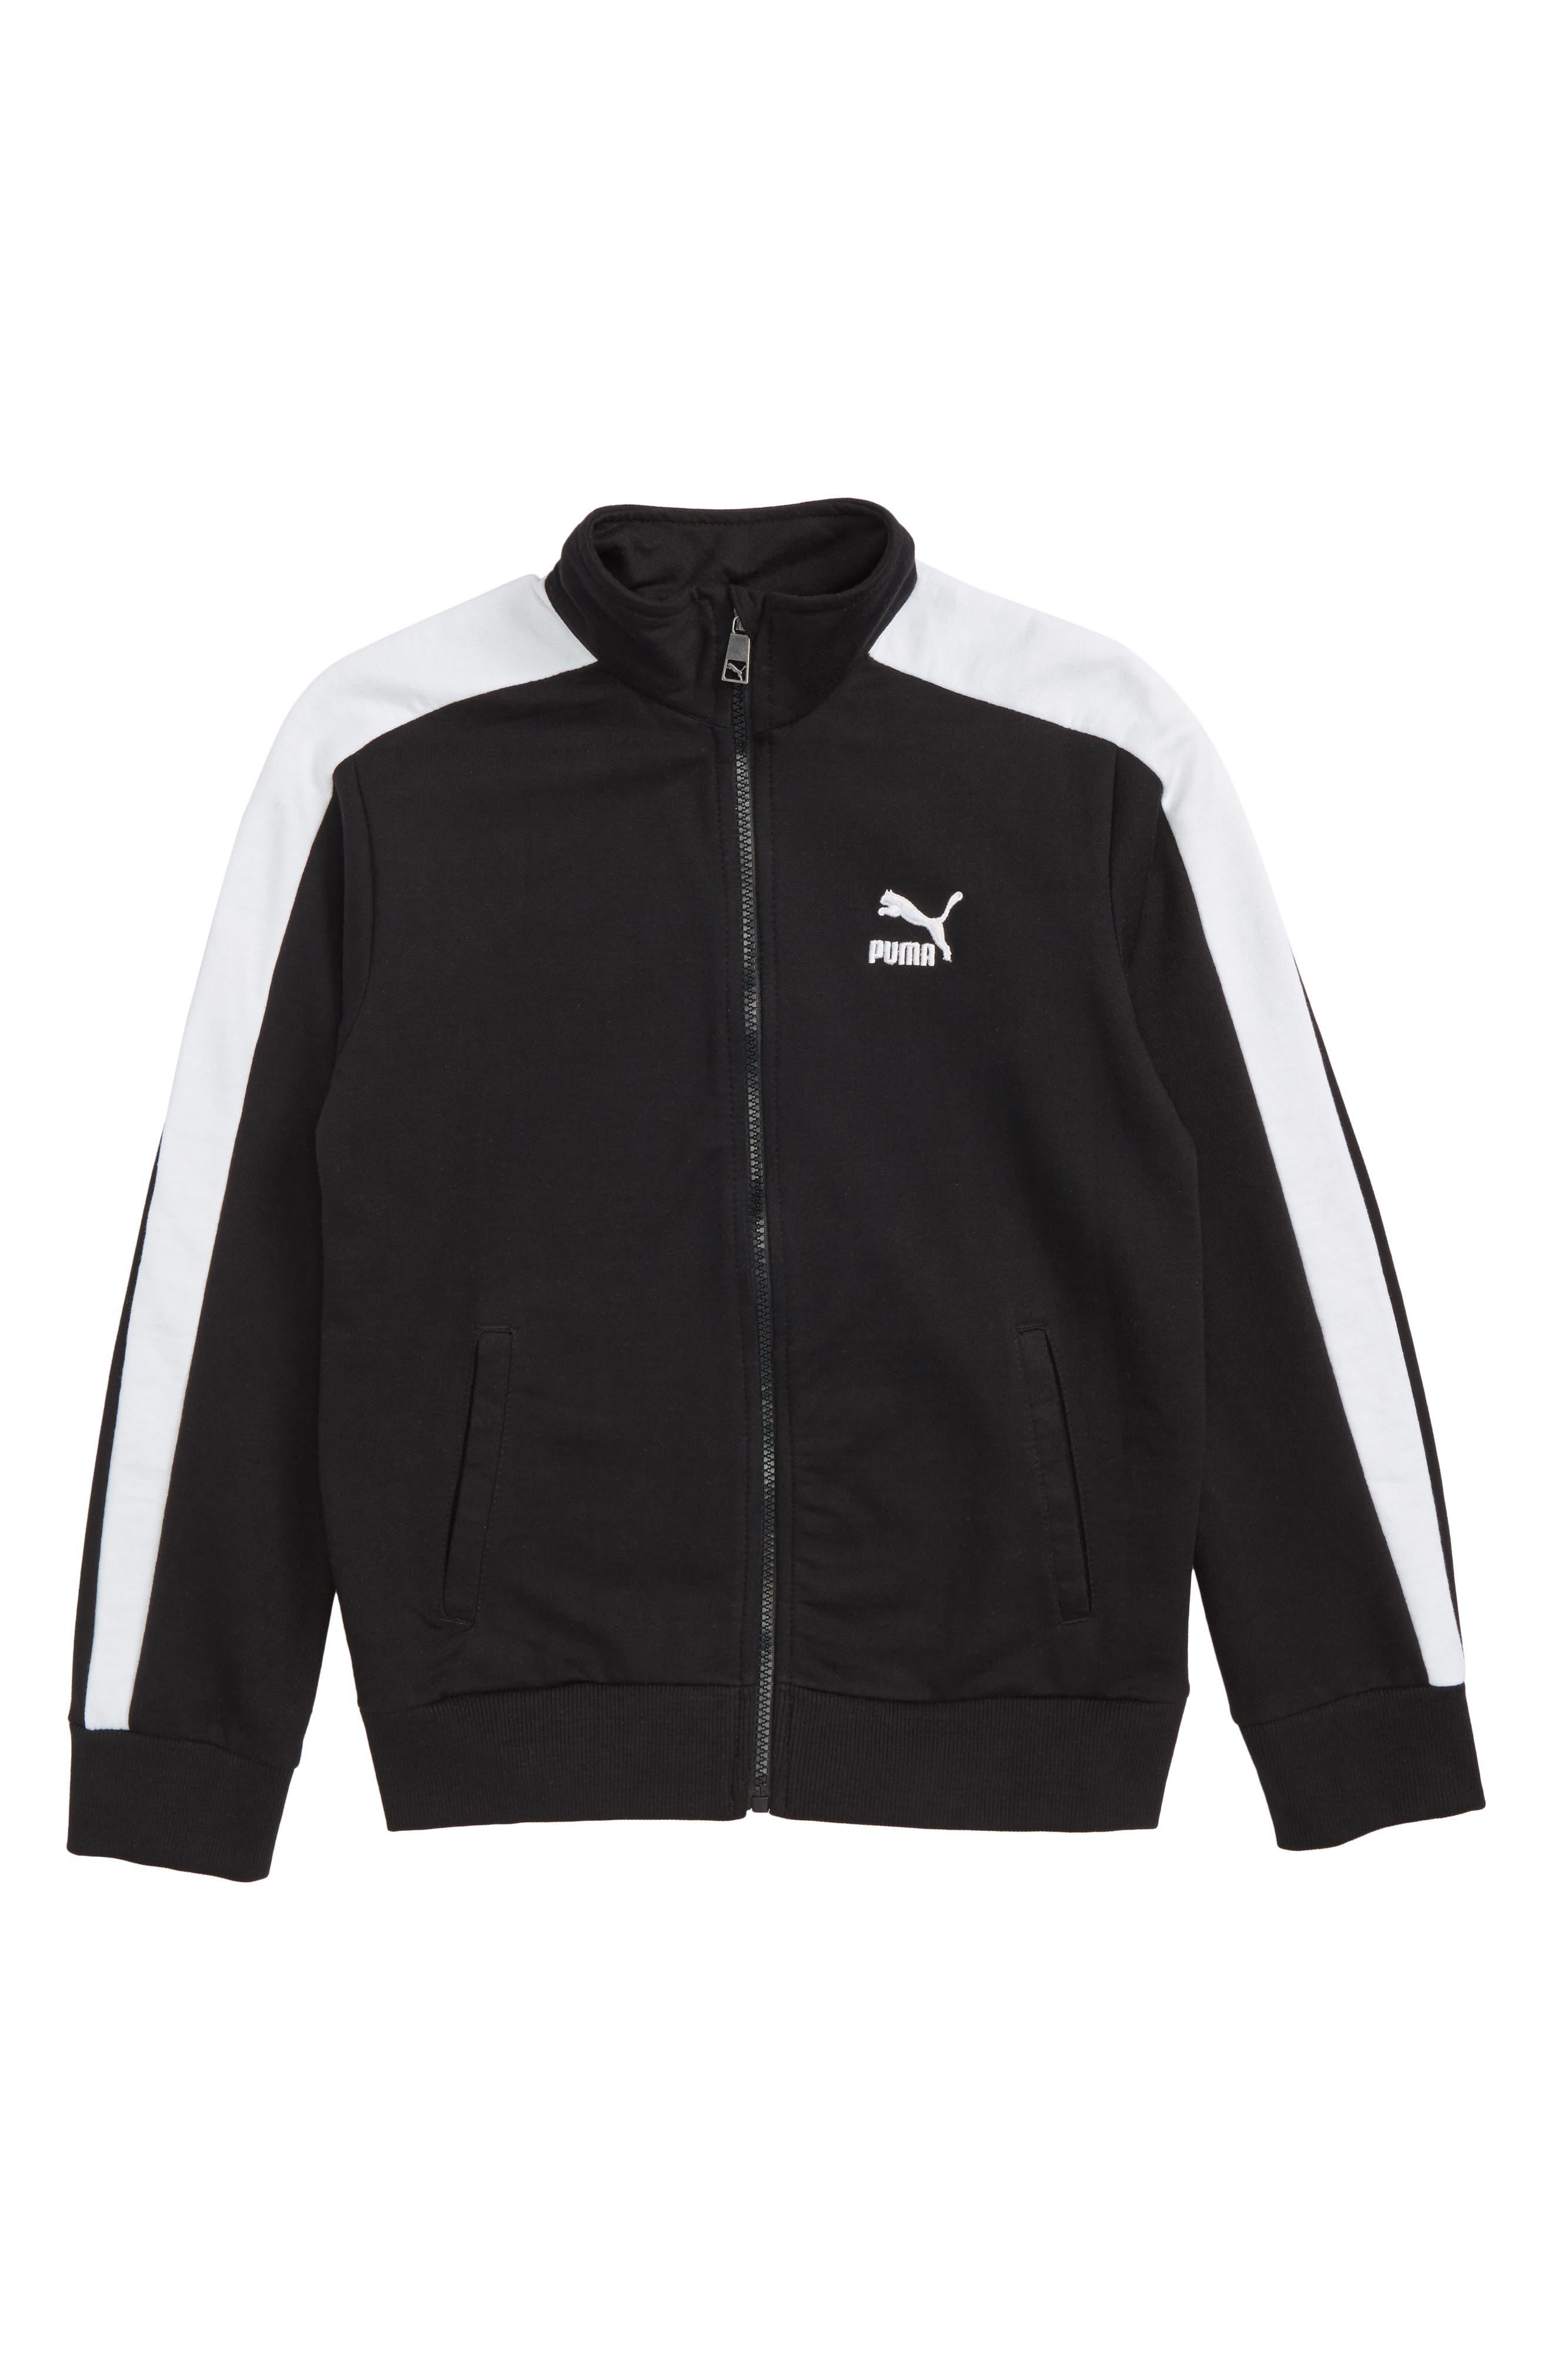 T7 Track Jacket,                             Main thumbnail 1, color,                             Puma Black